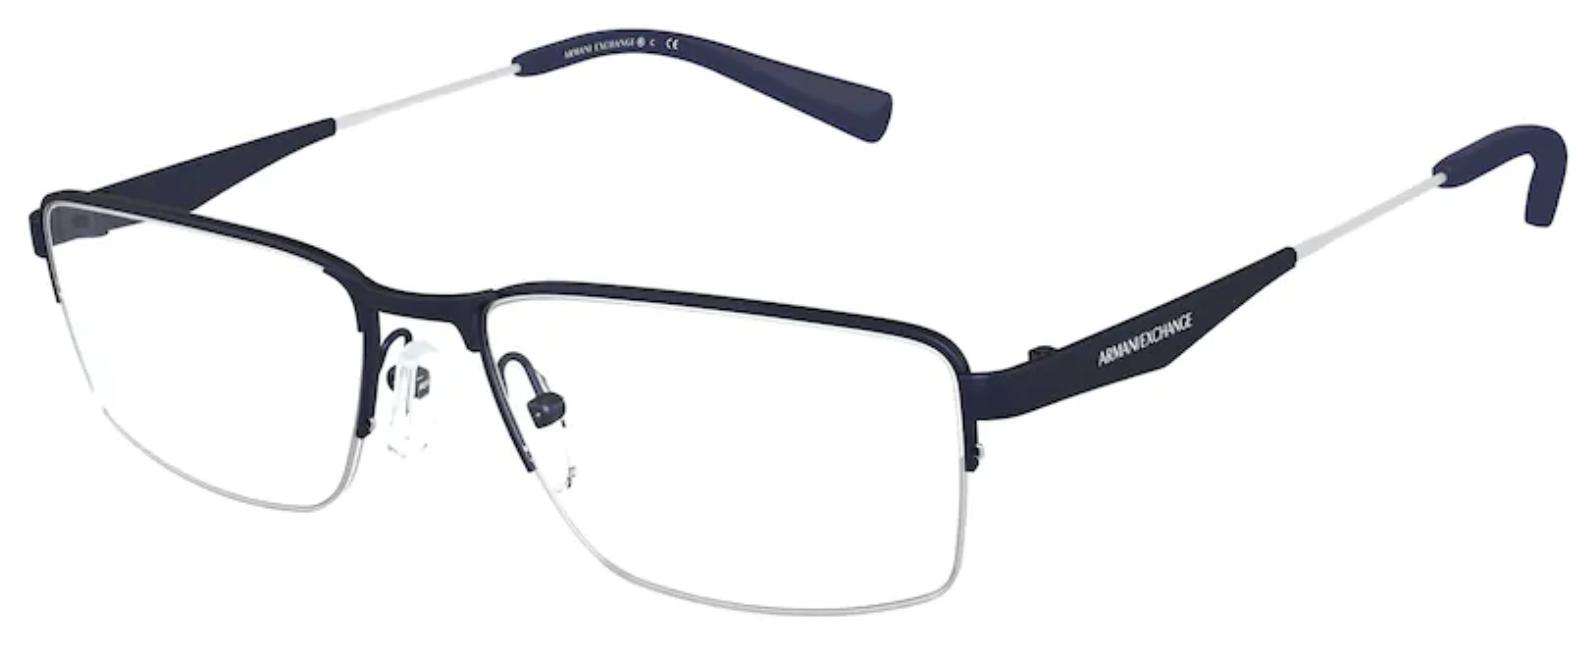 Óculos de Grau Armani Exchange Masculino AX 1038 6113 Tam.56